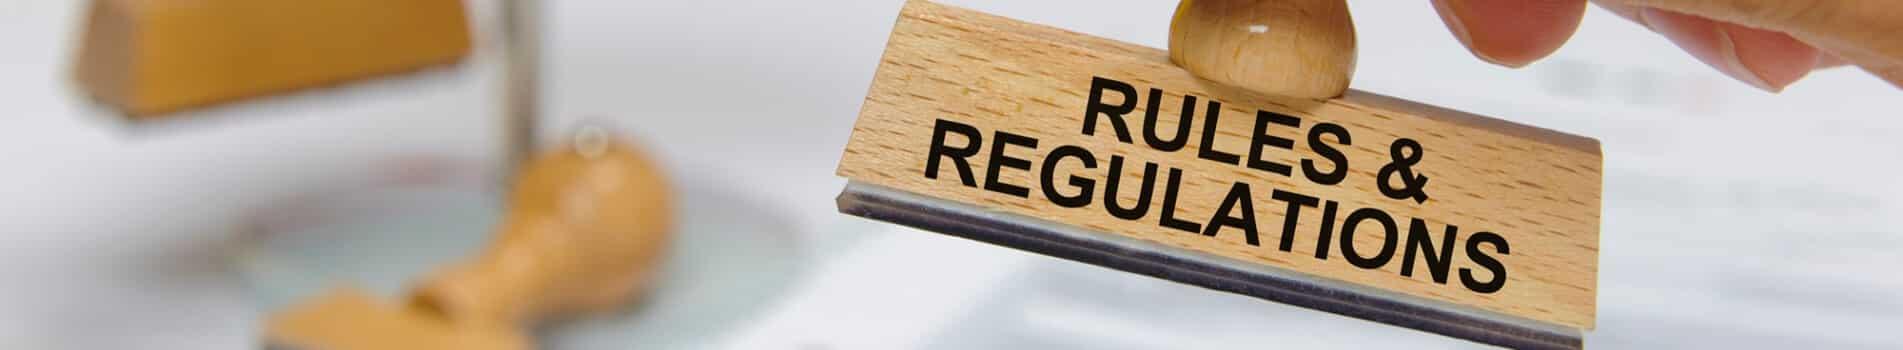 Regulatory & Government Compliance Salt Lake City